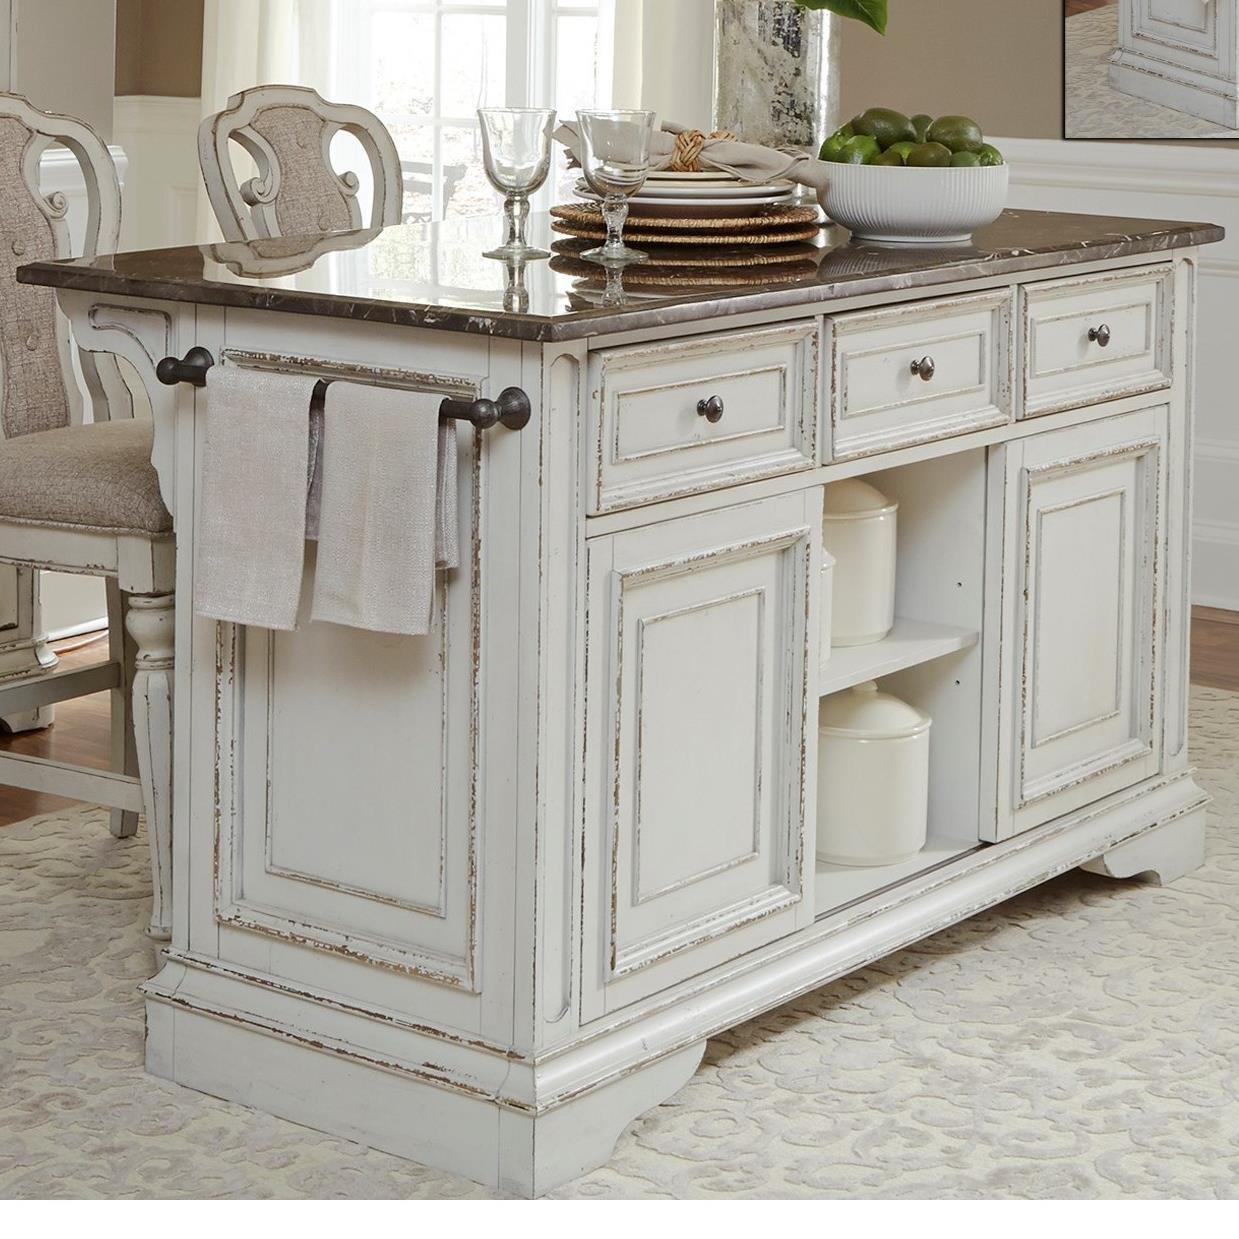 Sarah Randolph Designs Magnolia Manor DiningKitchen Island With Granite ...